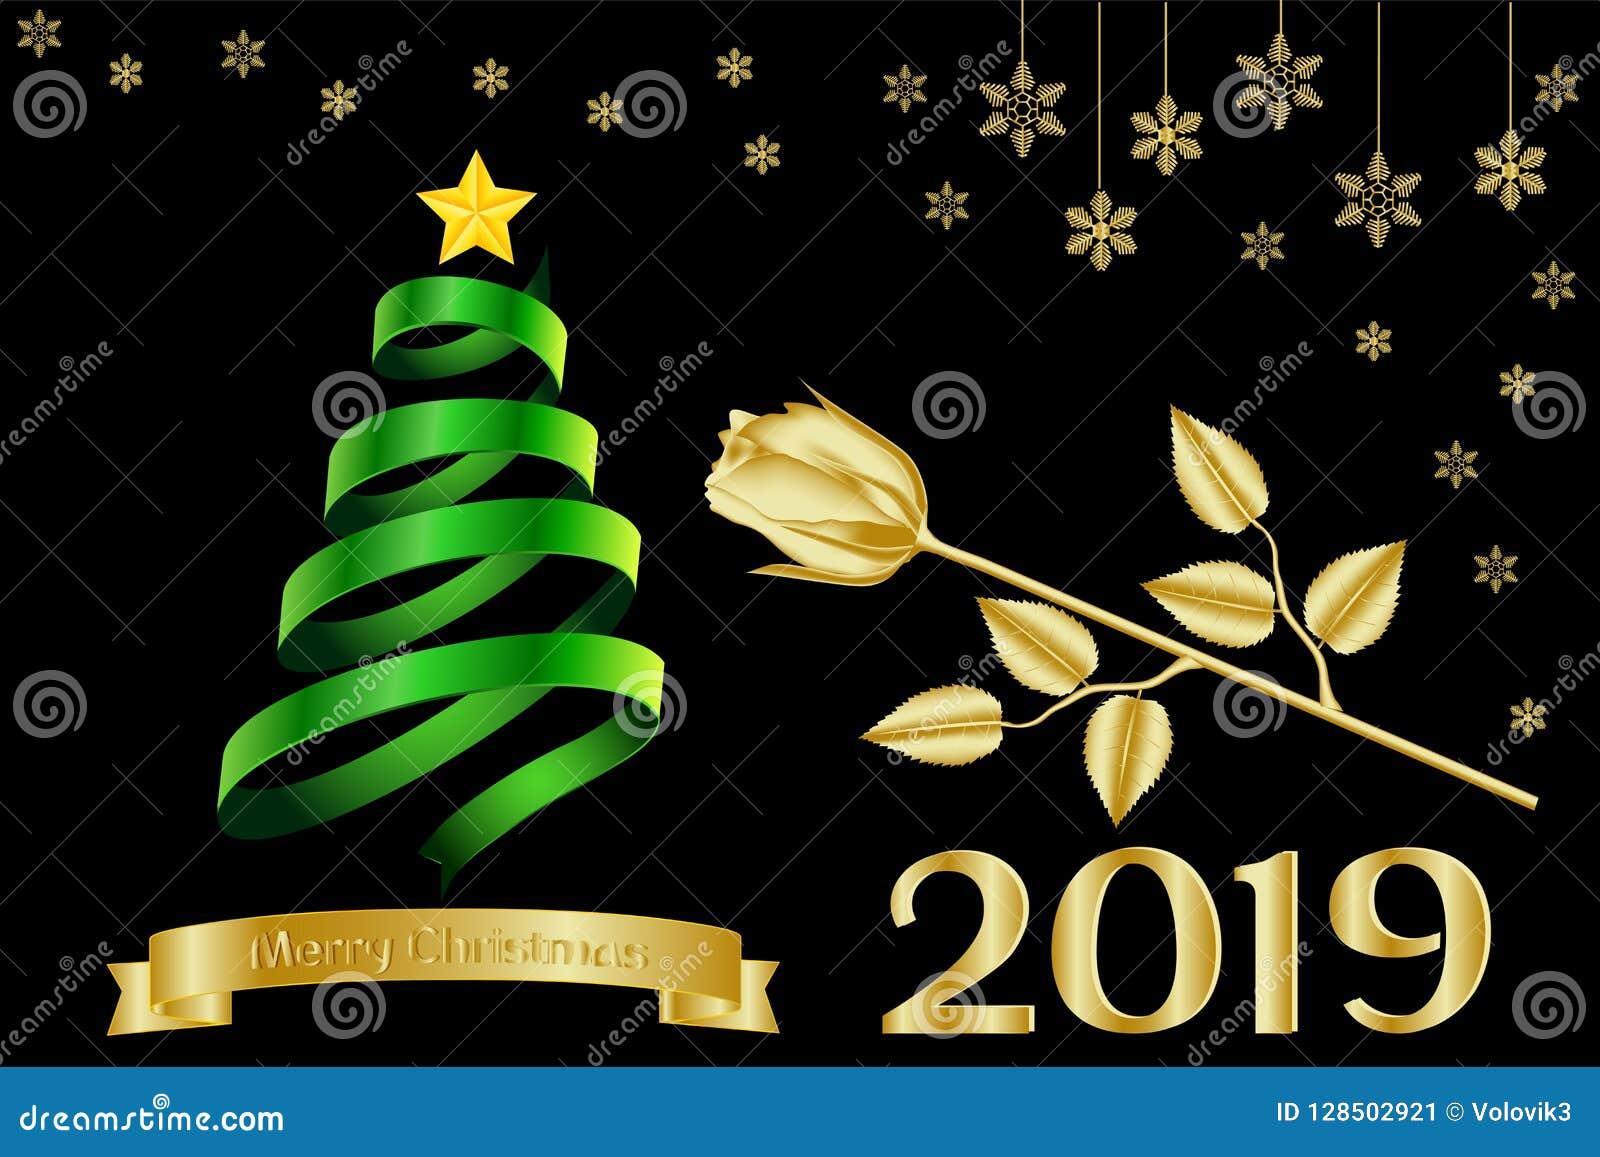 Merry Christmas 2019.Greeting Card Banner Calendar With A Golden Inscription